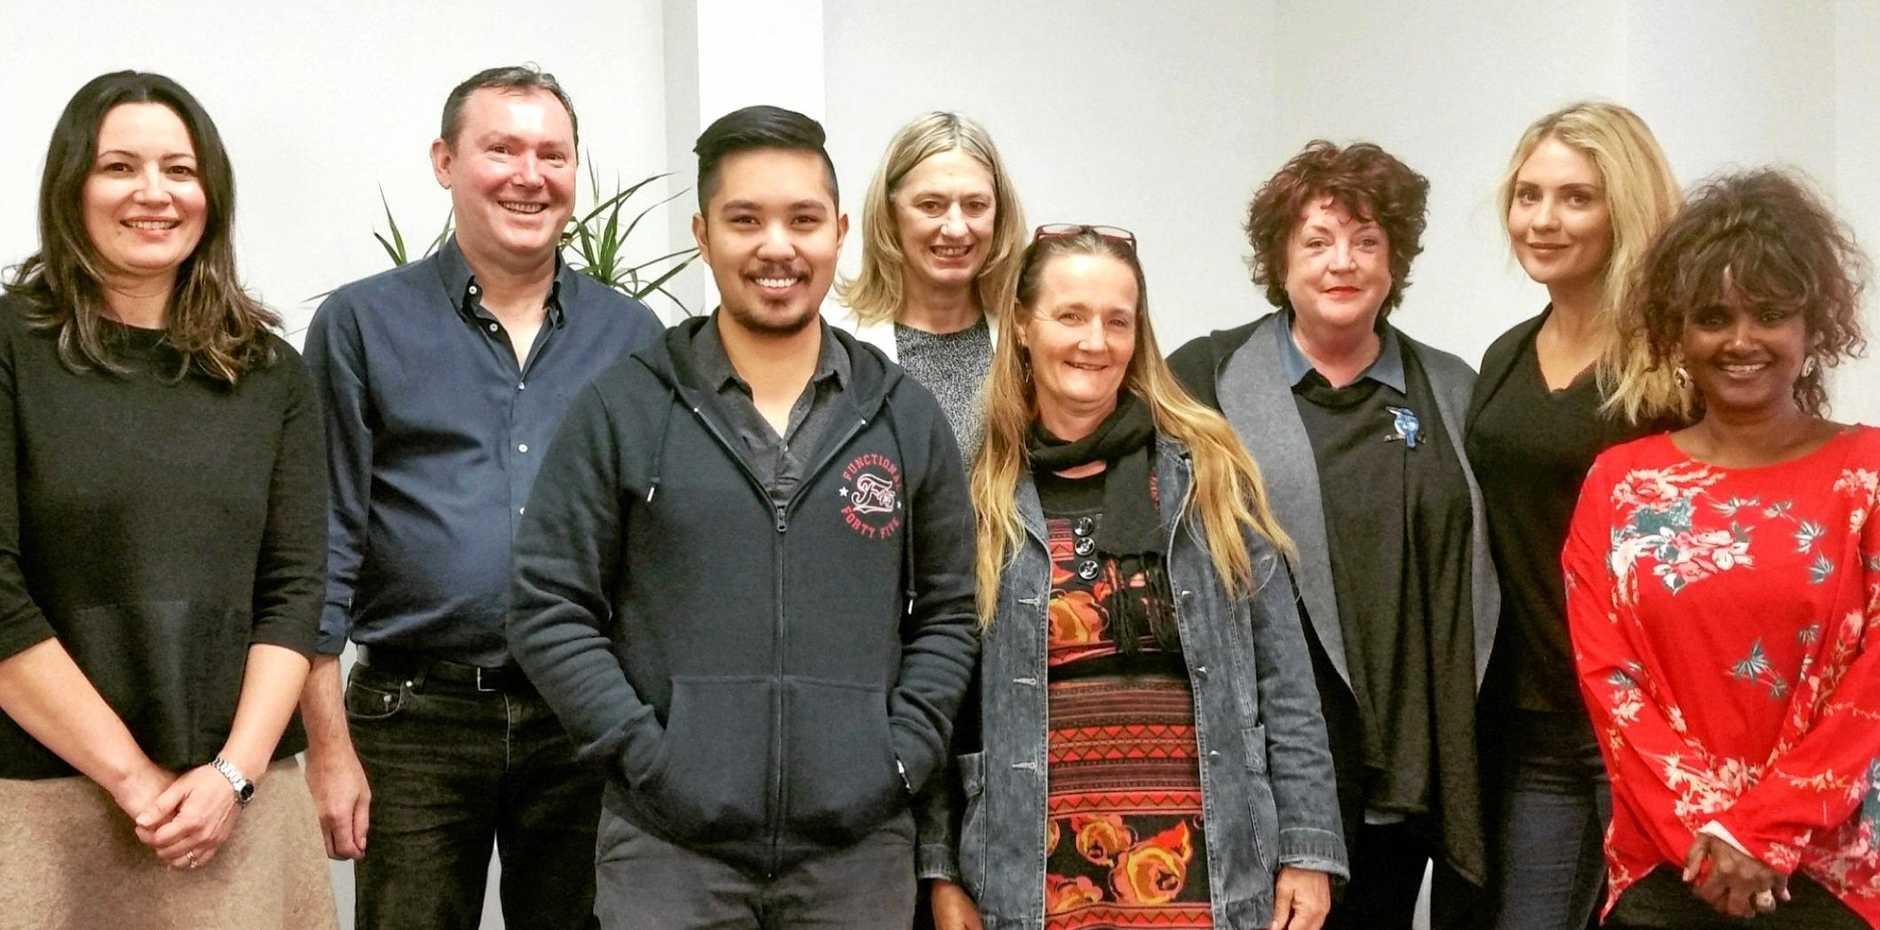 Maria Potiriadis, University of Melbourne, Steve Mann and the Link-me team